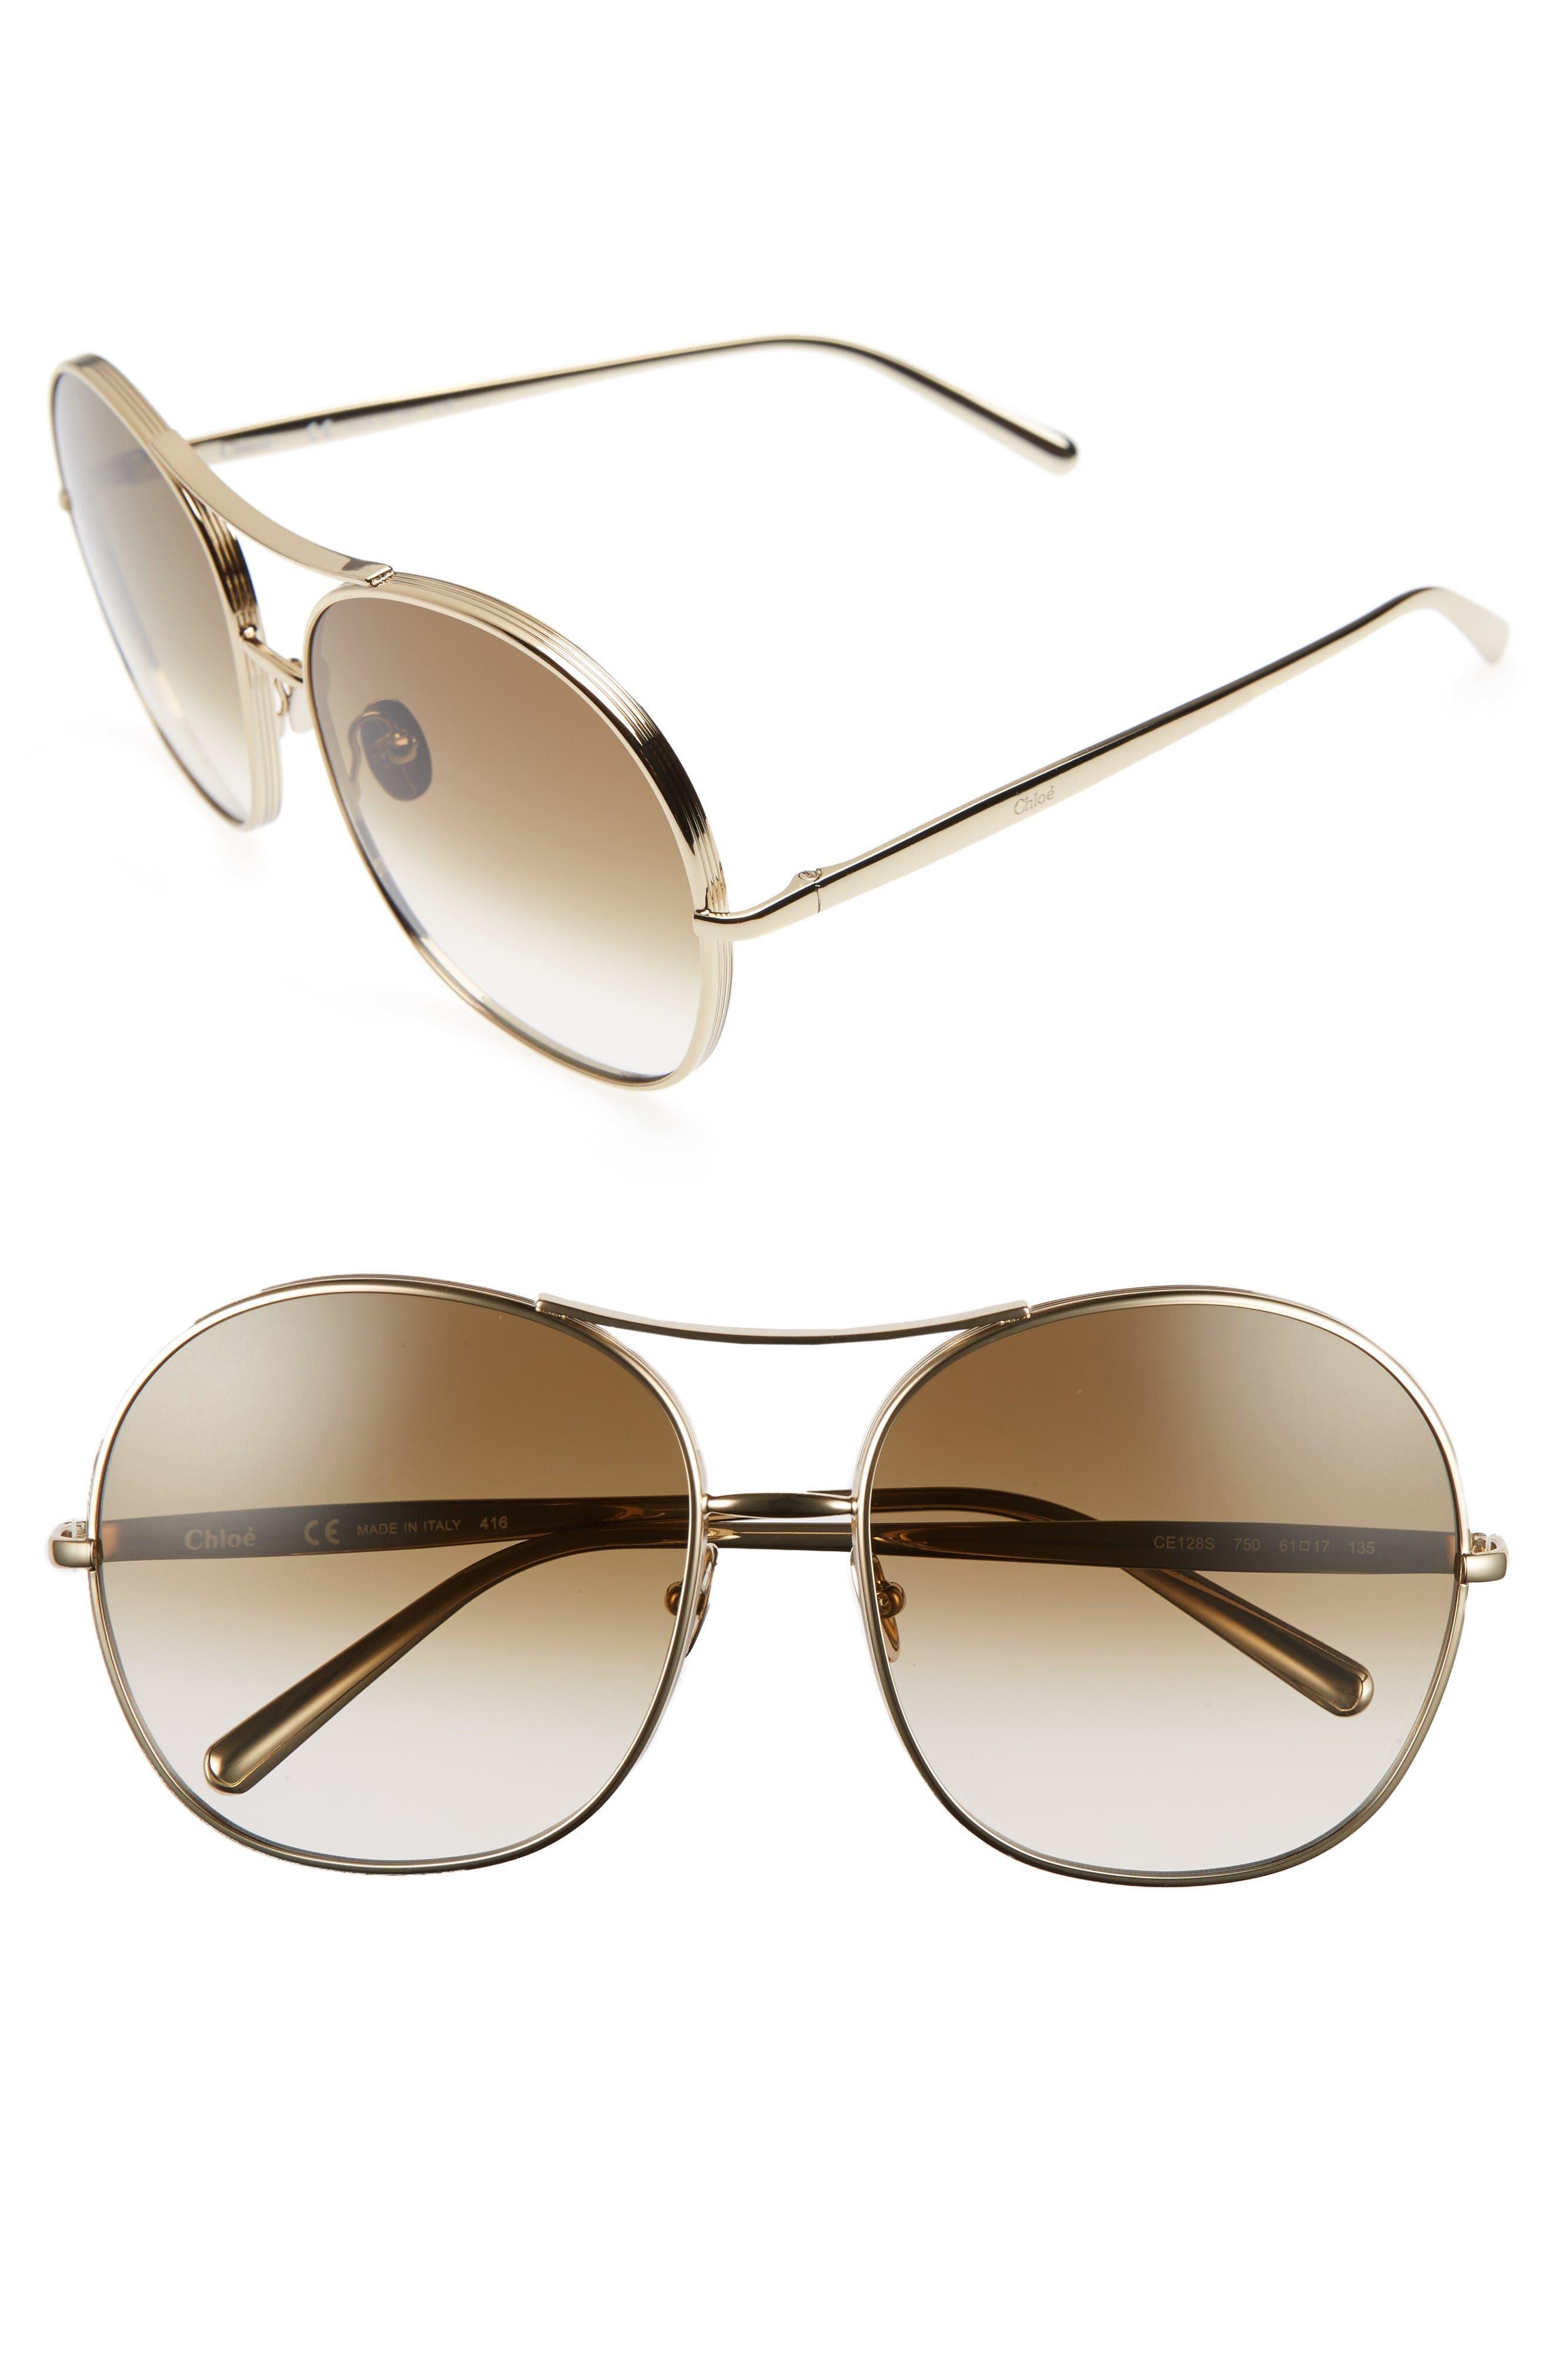 Chloé 61mm Oversize Aviator Sunglasses